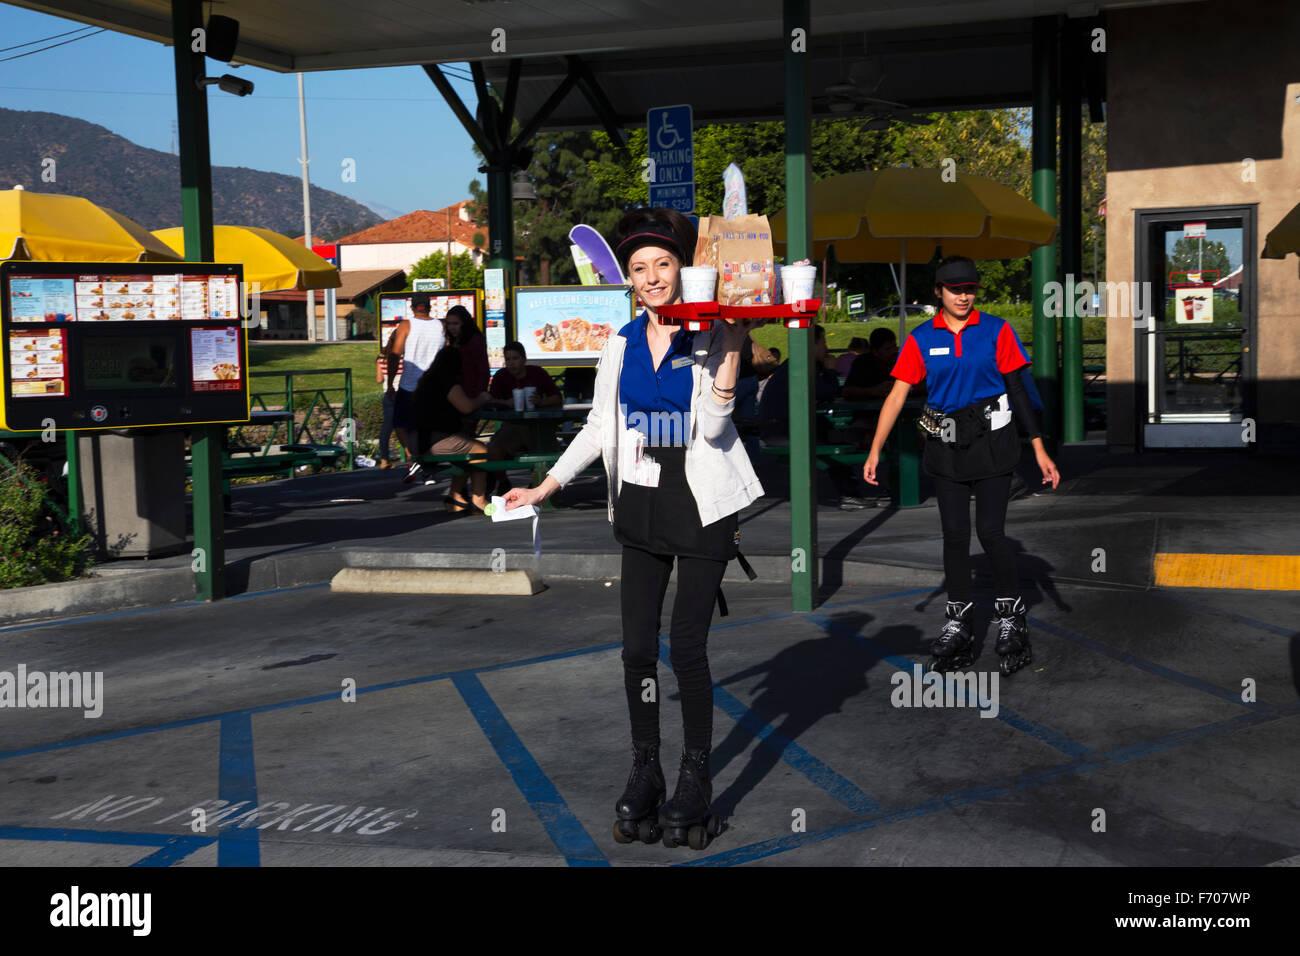 Southern California, USA, April 12, 2015, Car Hop, Waitress on rollerskates - Stock Image